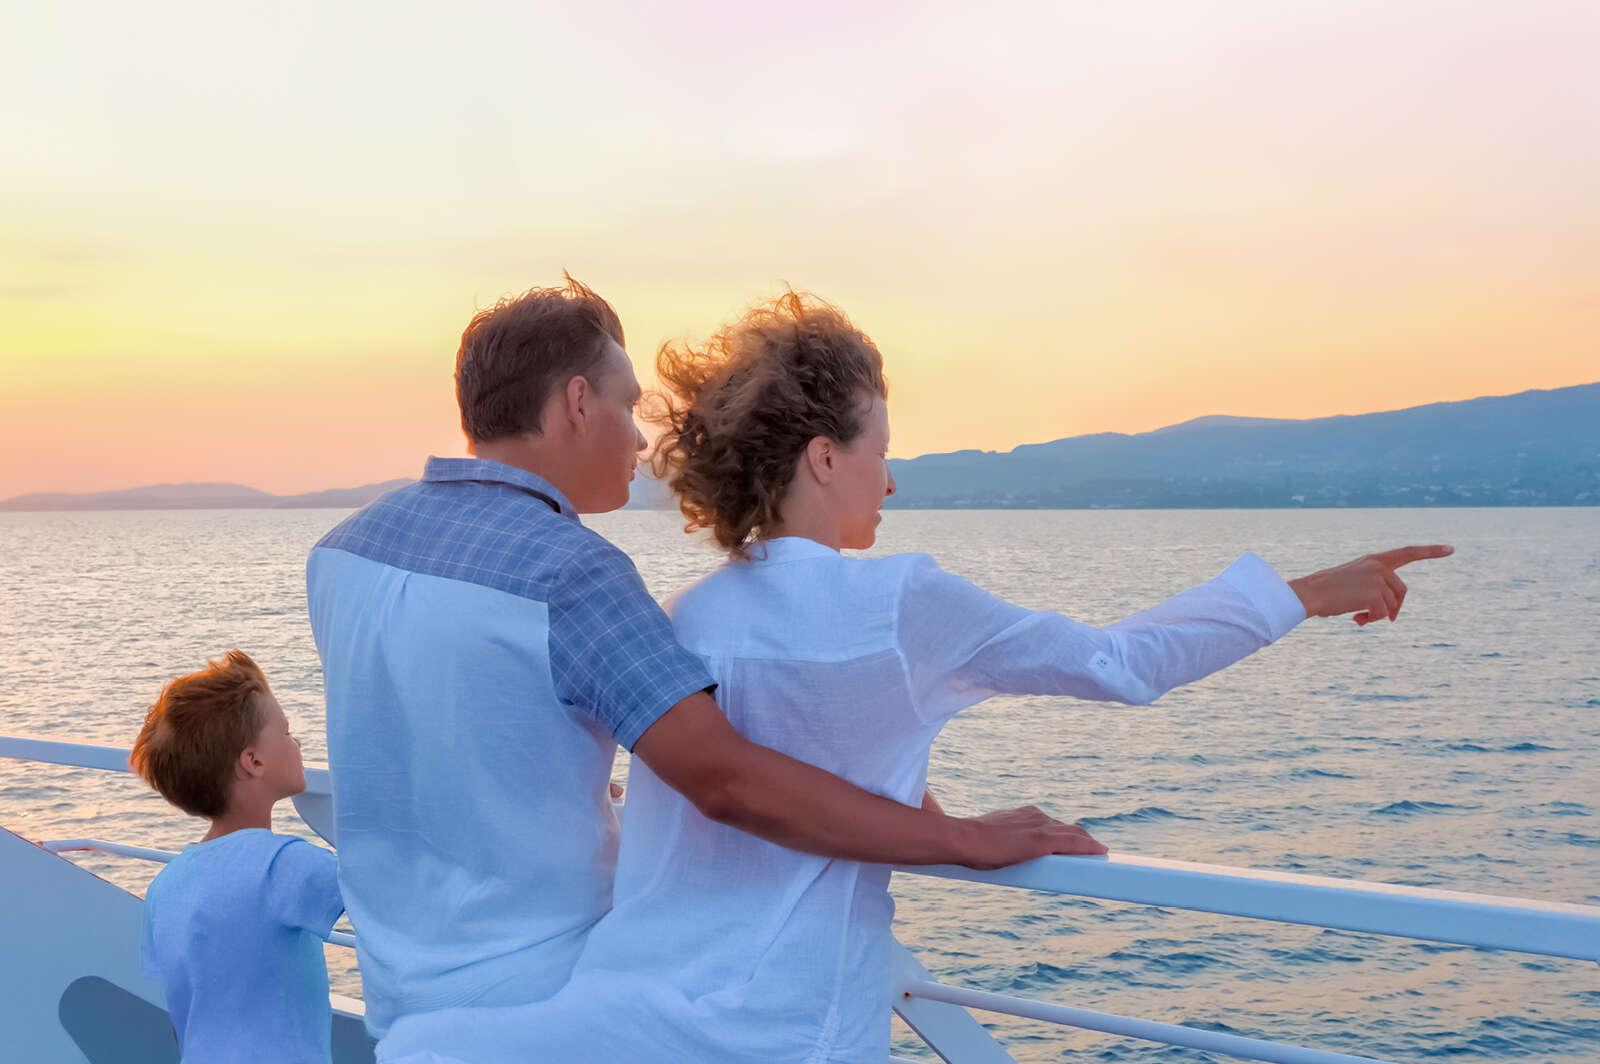 TravelBrands Cruises by Encore - $0 Deposit-No deposit until 6 months prior to sailing!